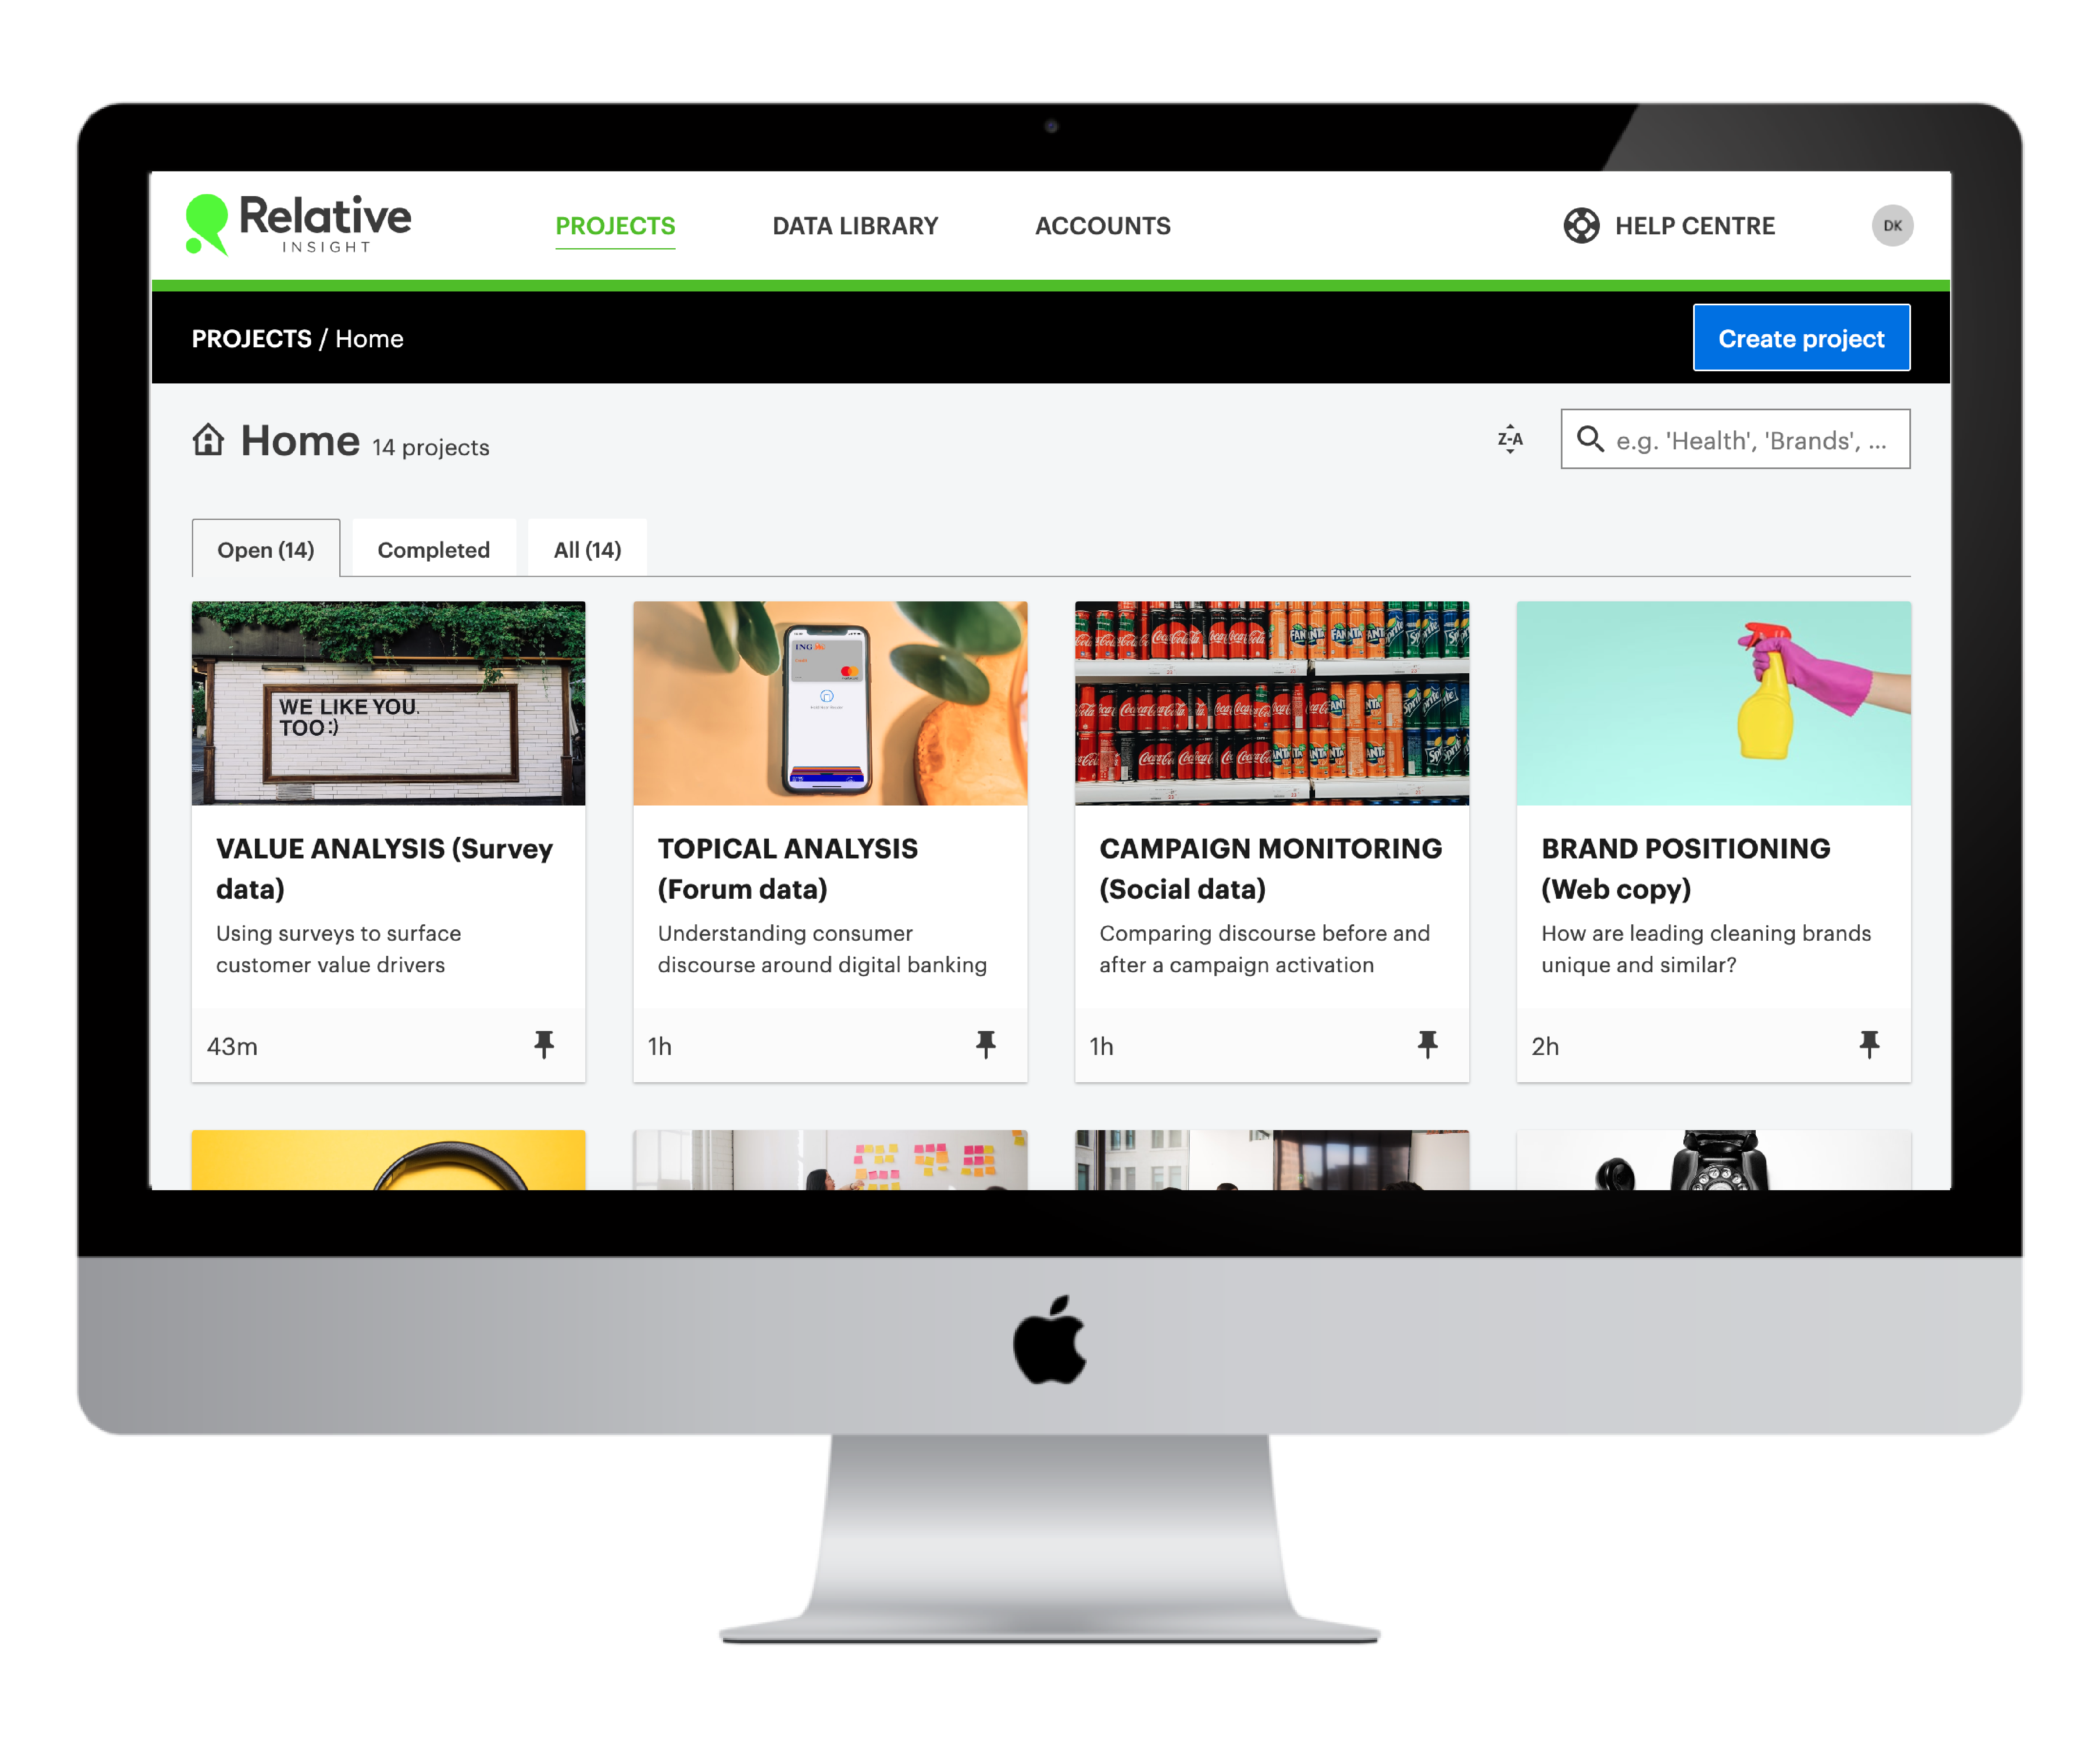 iMac showing Relative Insight marketing insights platform